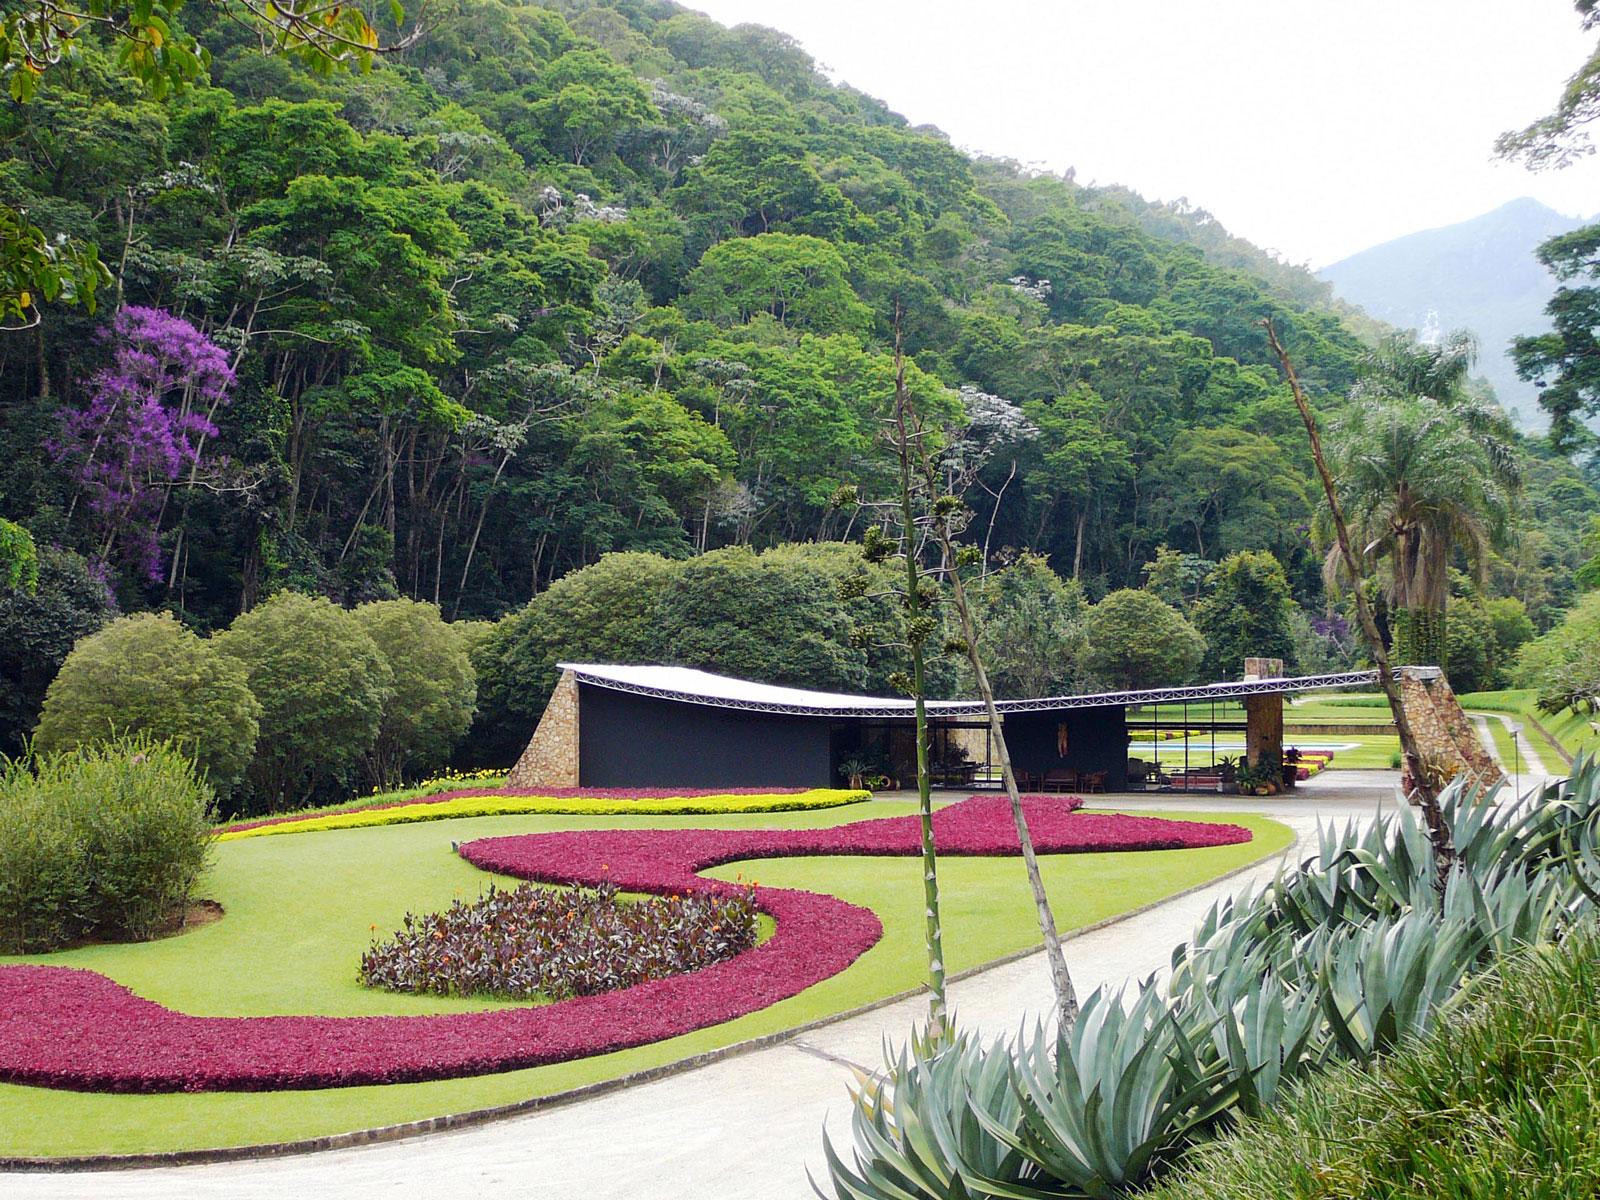 Edmundo Cavanellas Residence, designed by Oscar Niemeyer with landscape design by Roberto Burle Marx, 1954